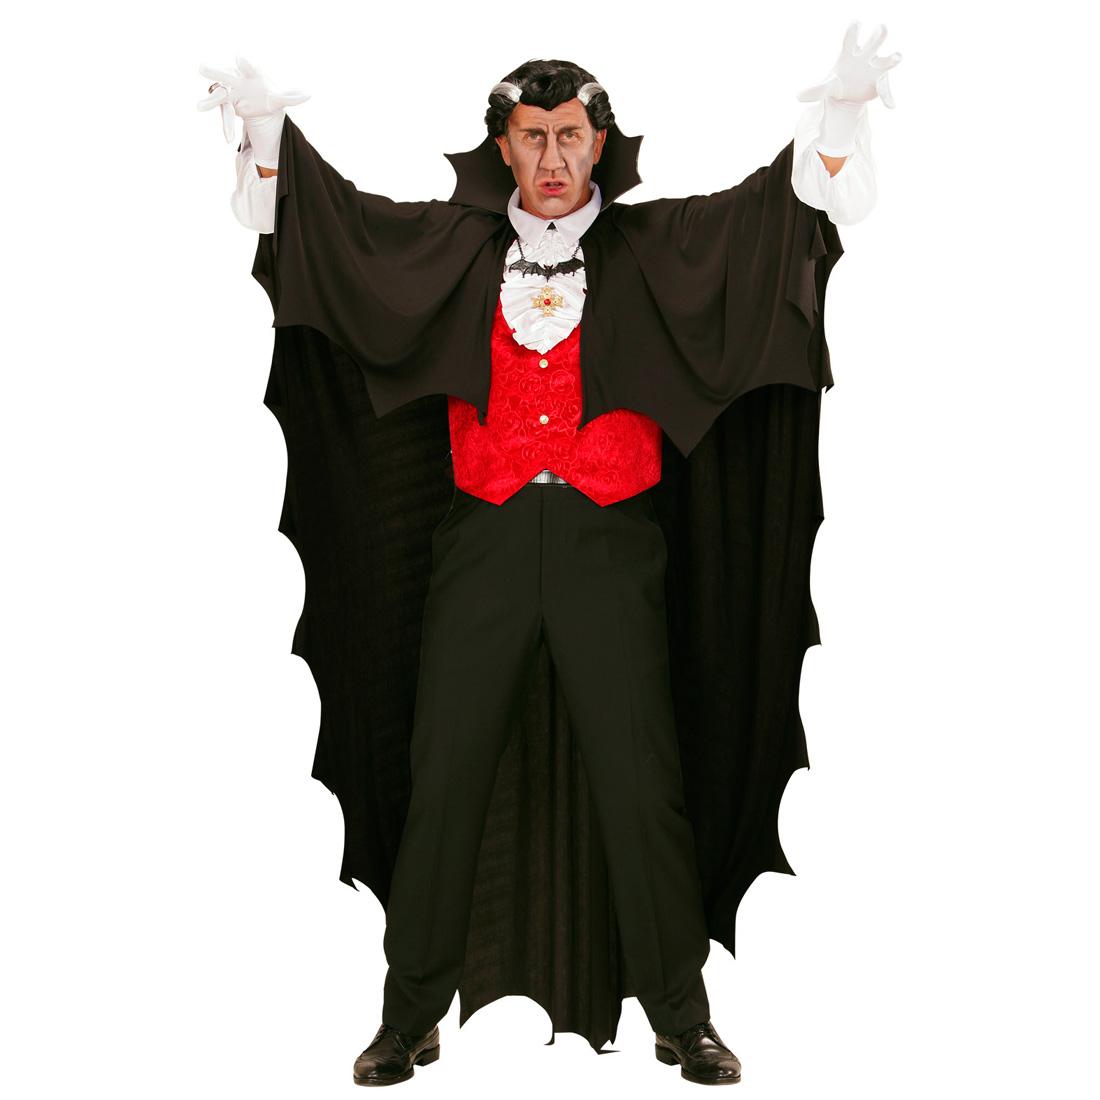 halloween vampirumhang fledermaus umhang vampir gewand dracula mantel kost m ebay. Black Bedroom Furniture Sets. Home Design Ideas